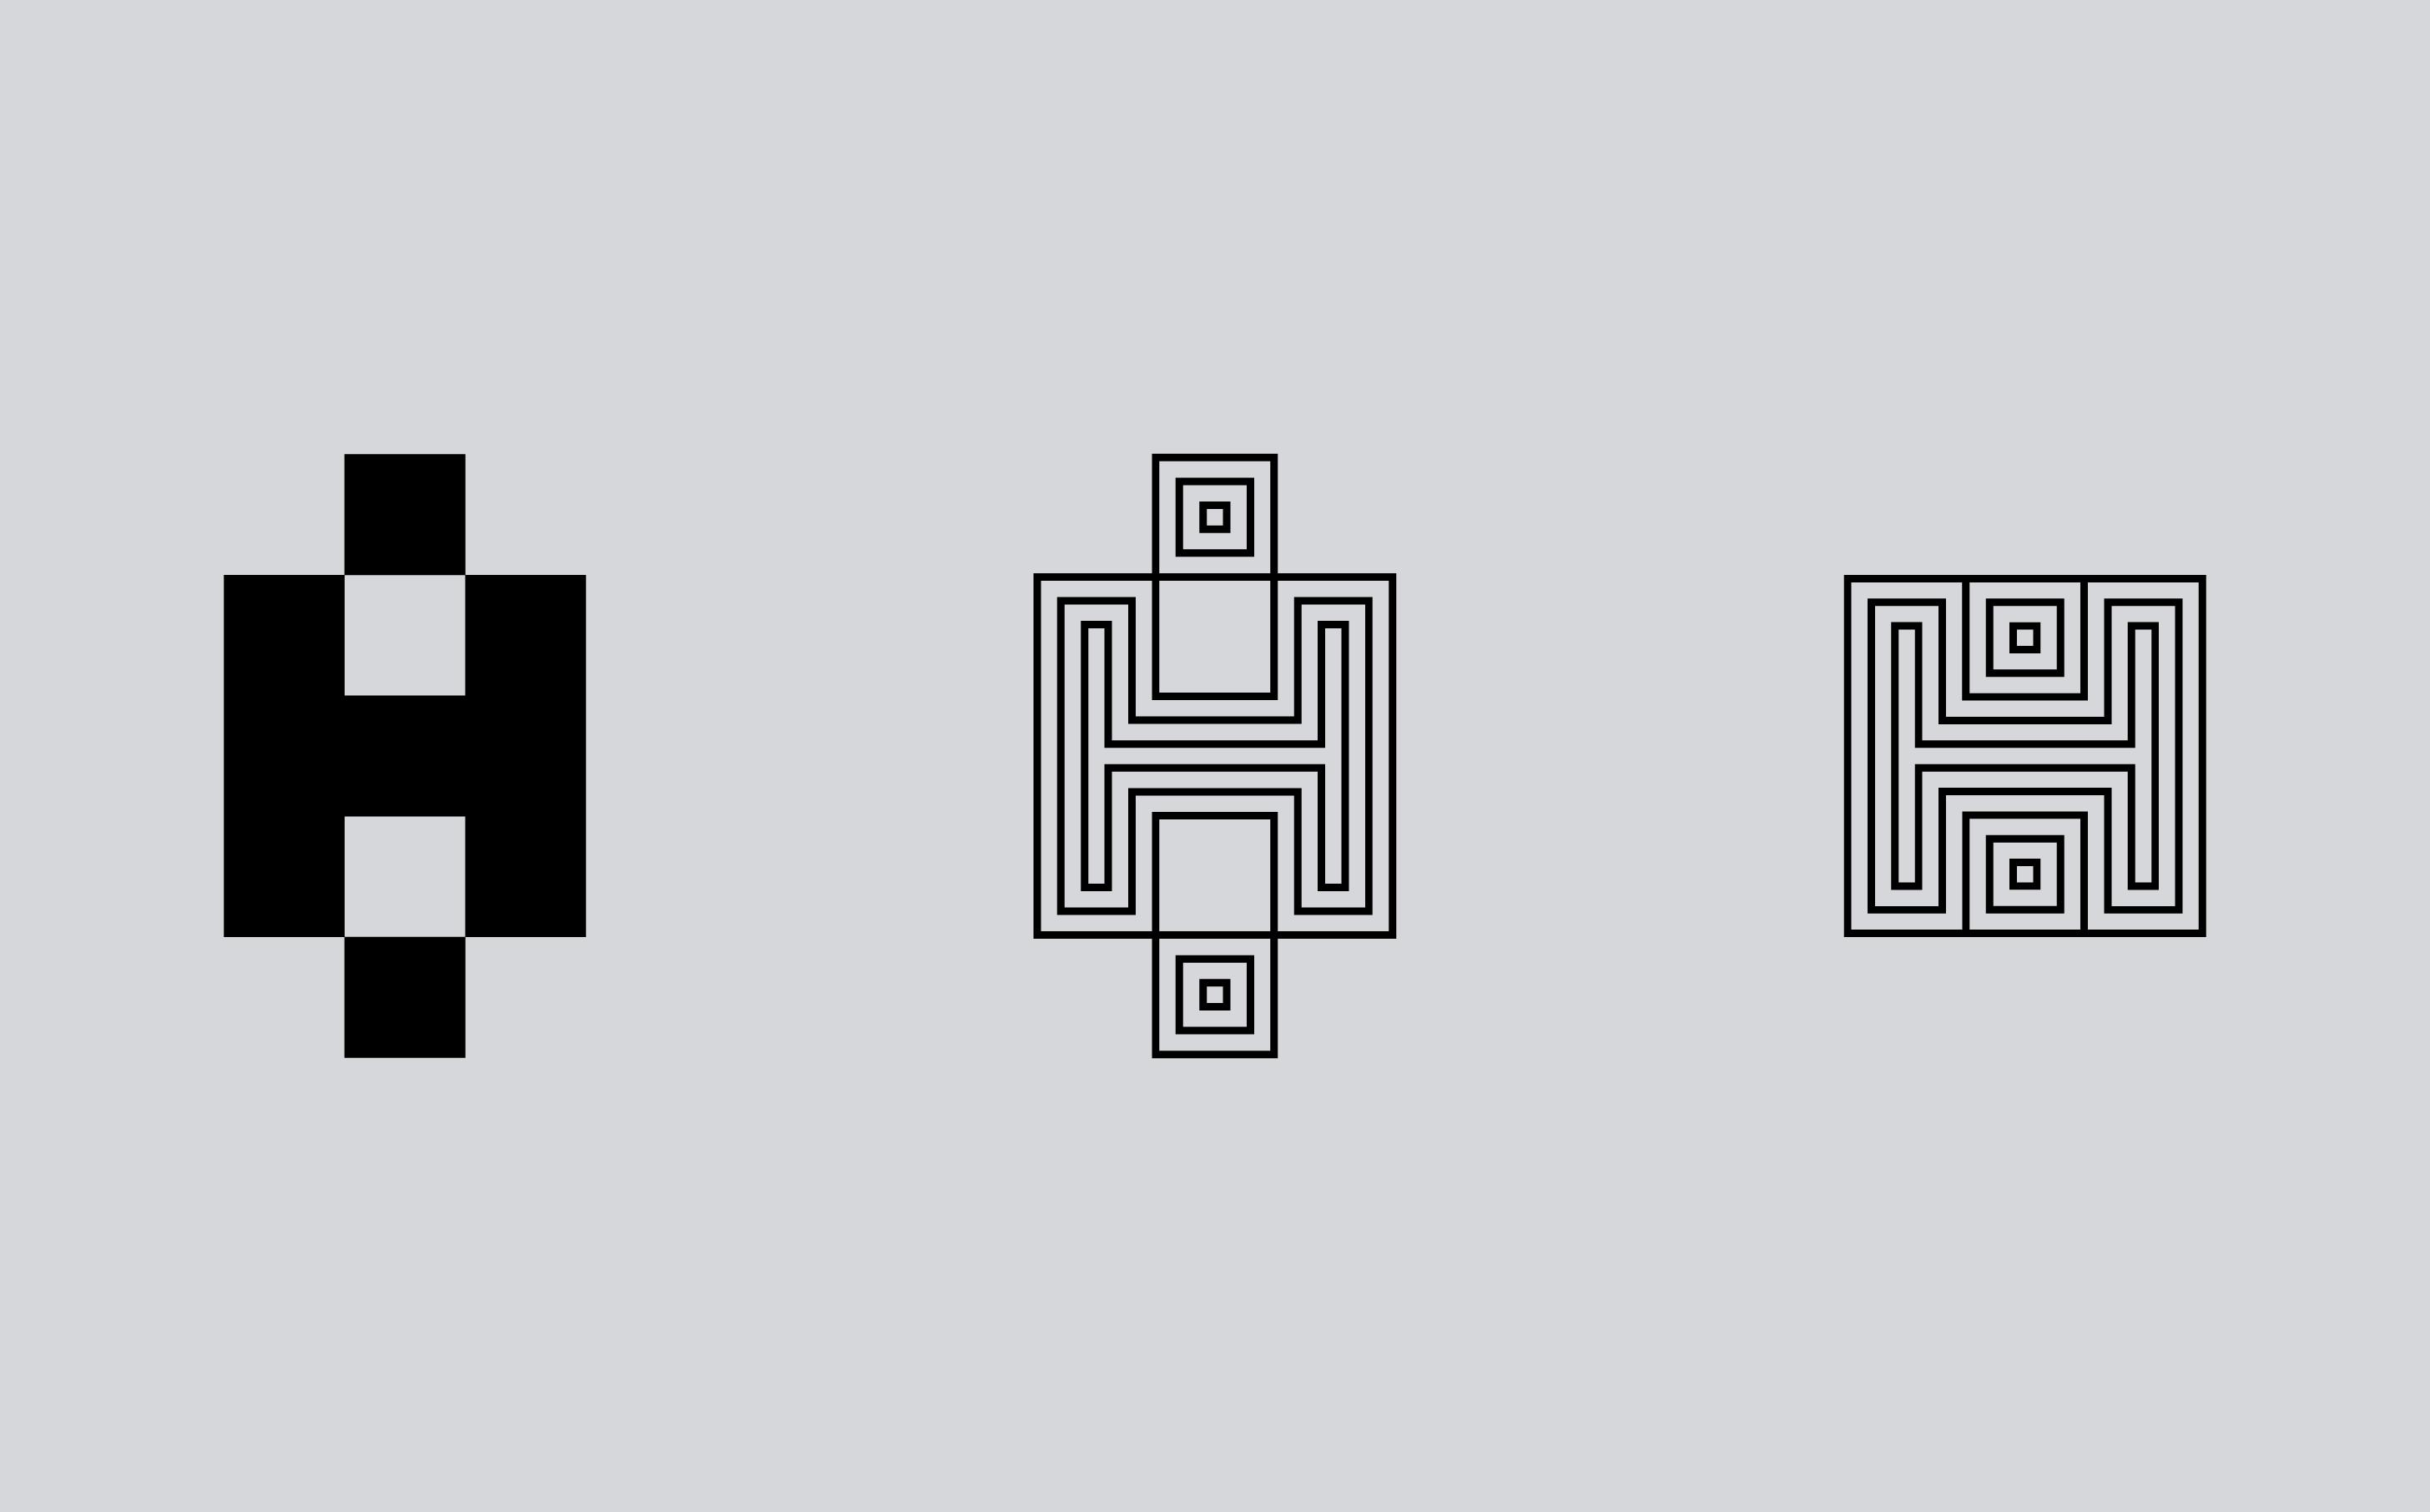 horazon-logo-design-03